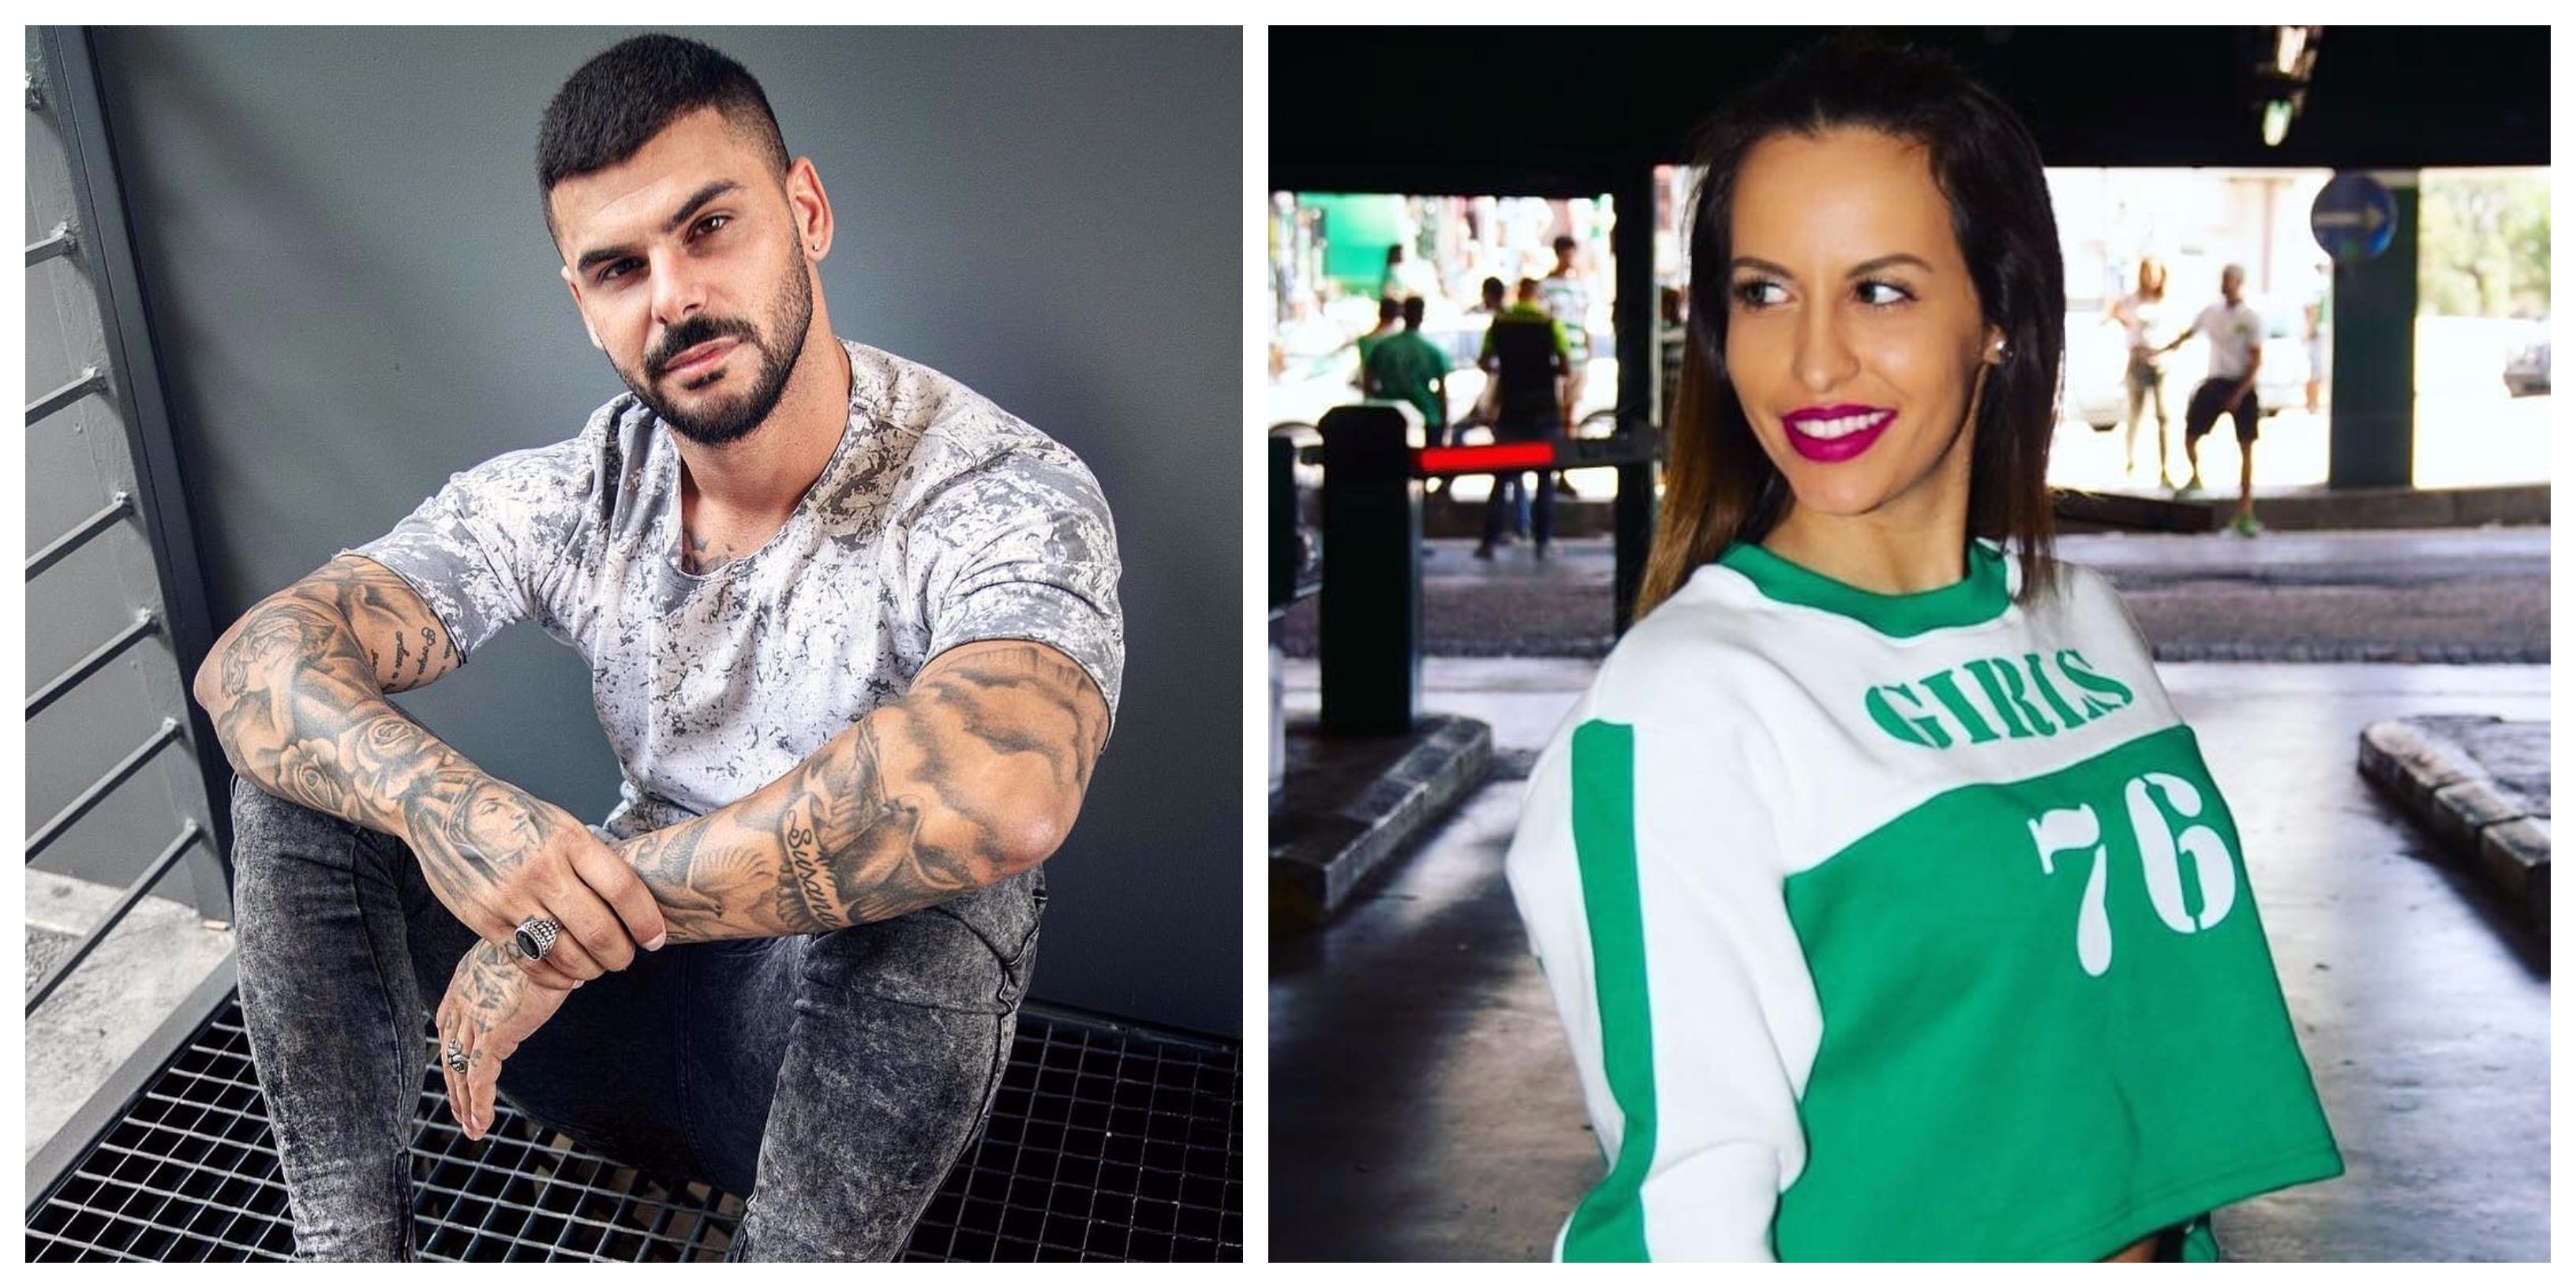 Bruno Marvao Kika Gomes Kika E Marvão Dão Beijo Apaixonado